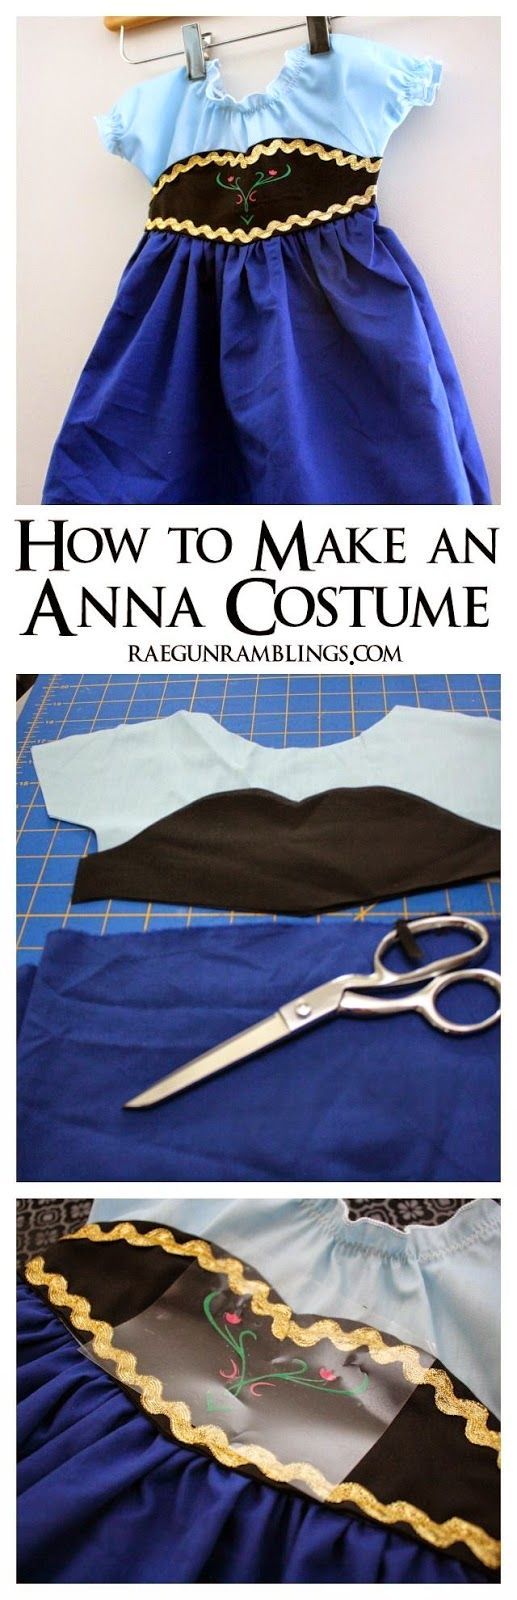 Best DIY Projects: DIY Frozen Anna Costume Tutorial - Rae Gun Ramblings